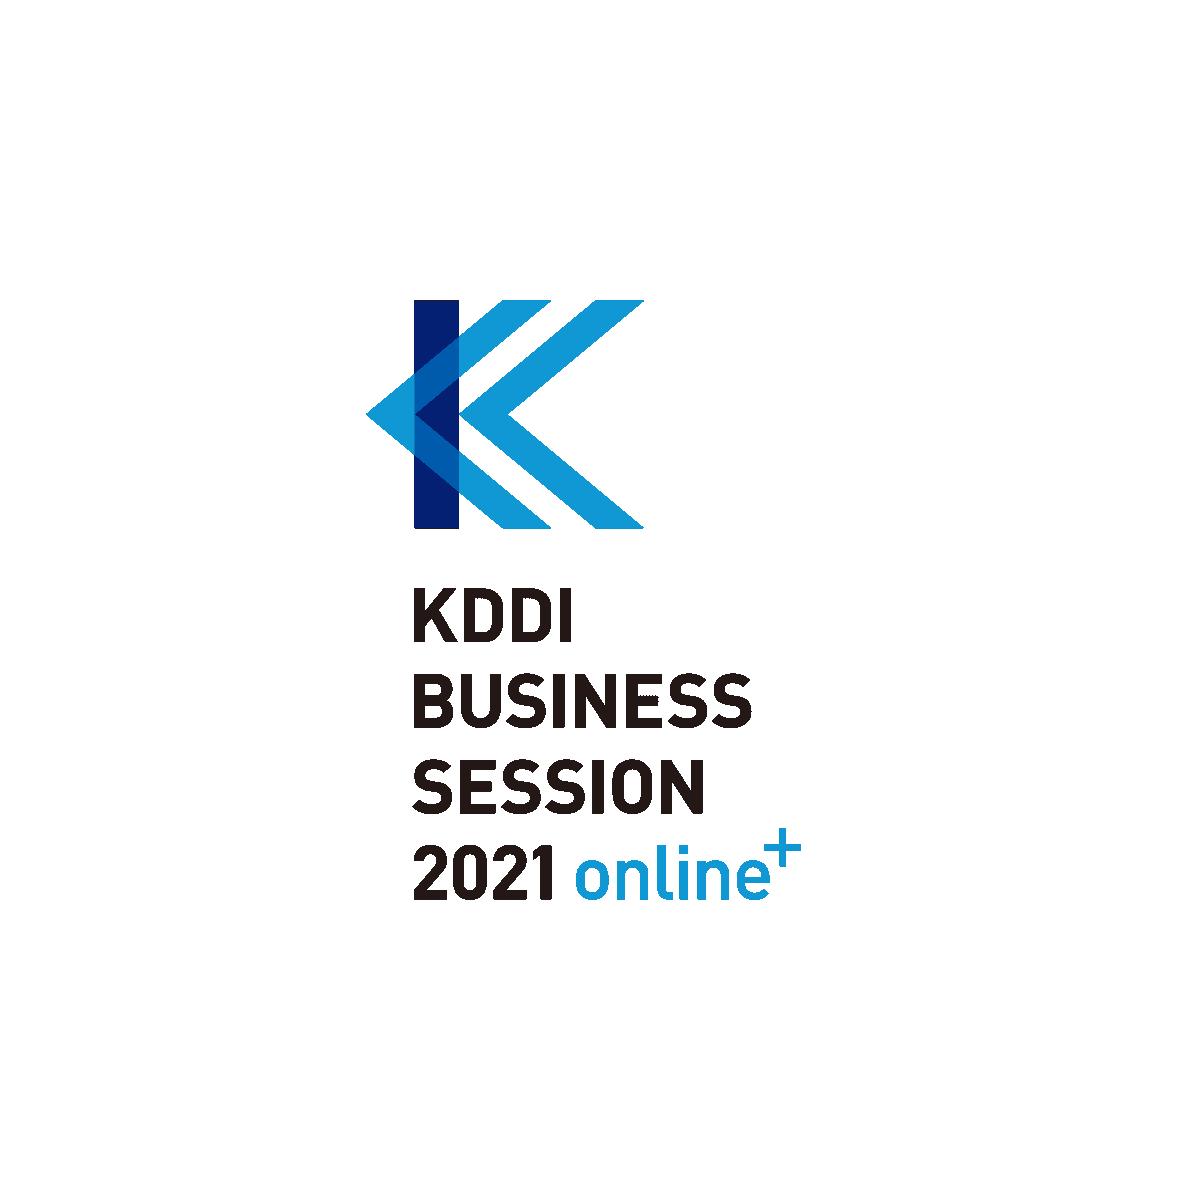 KDDI BUSINESS SESSION 2021 online+